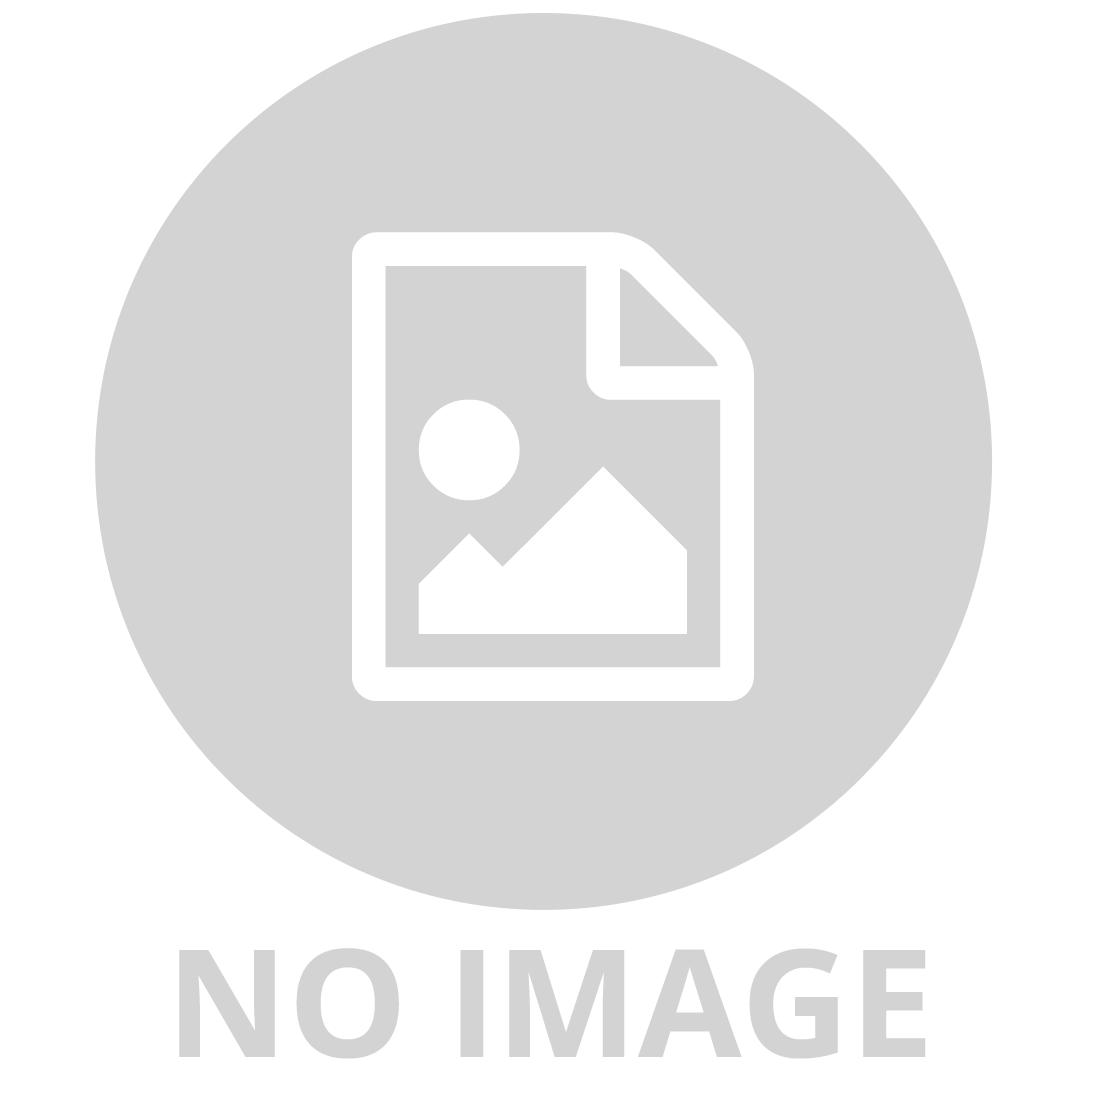 LEGO MARVEL 76164 IRON MAN HULKBUSTER VS A.I.M. AGENT